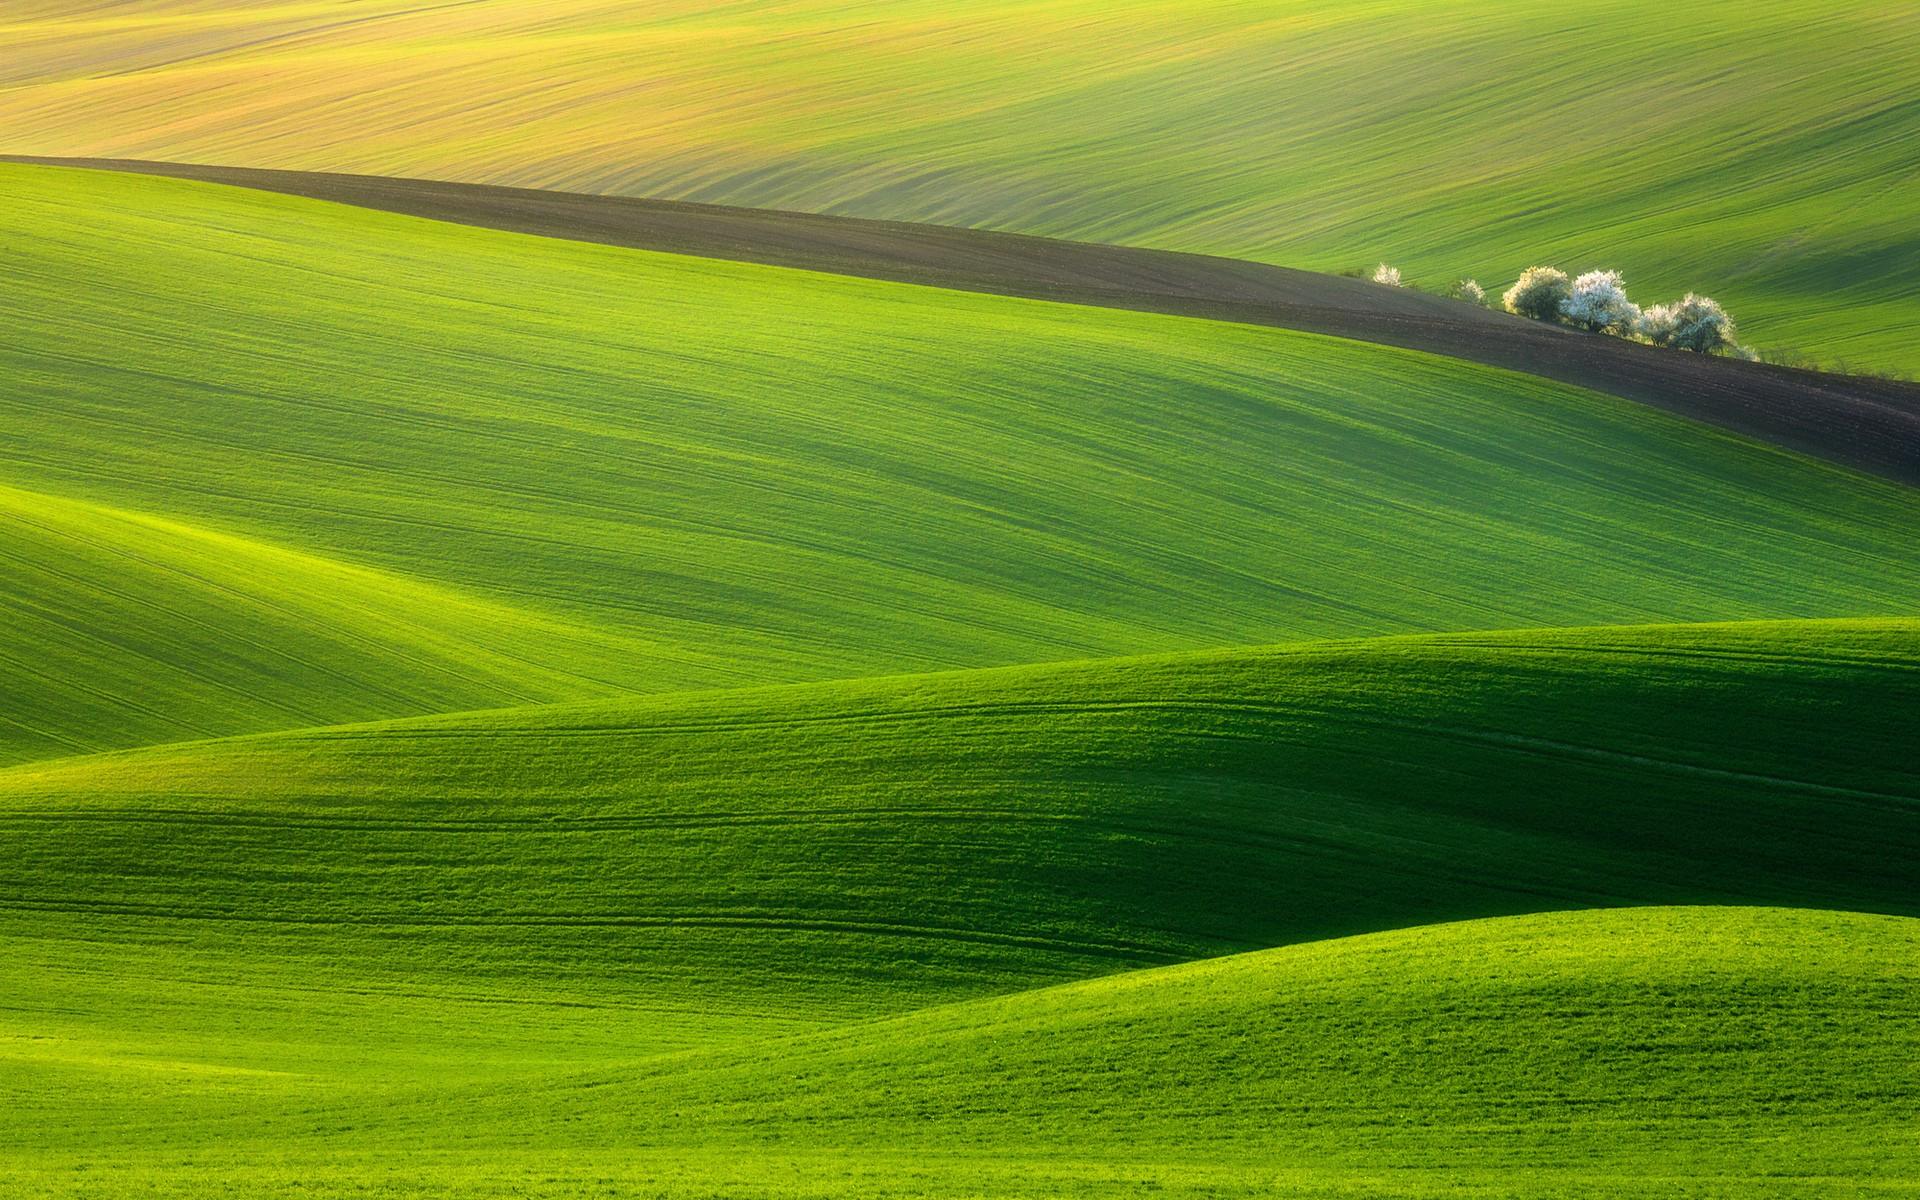 General 1920x1200 nature landscape grass field hills